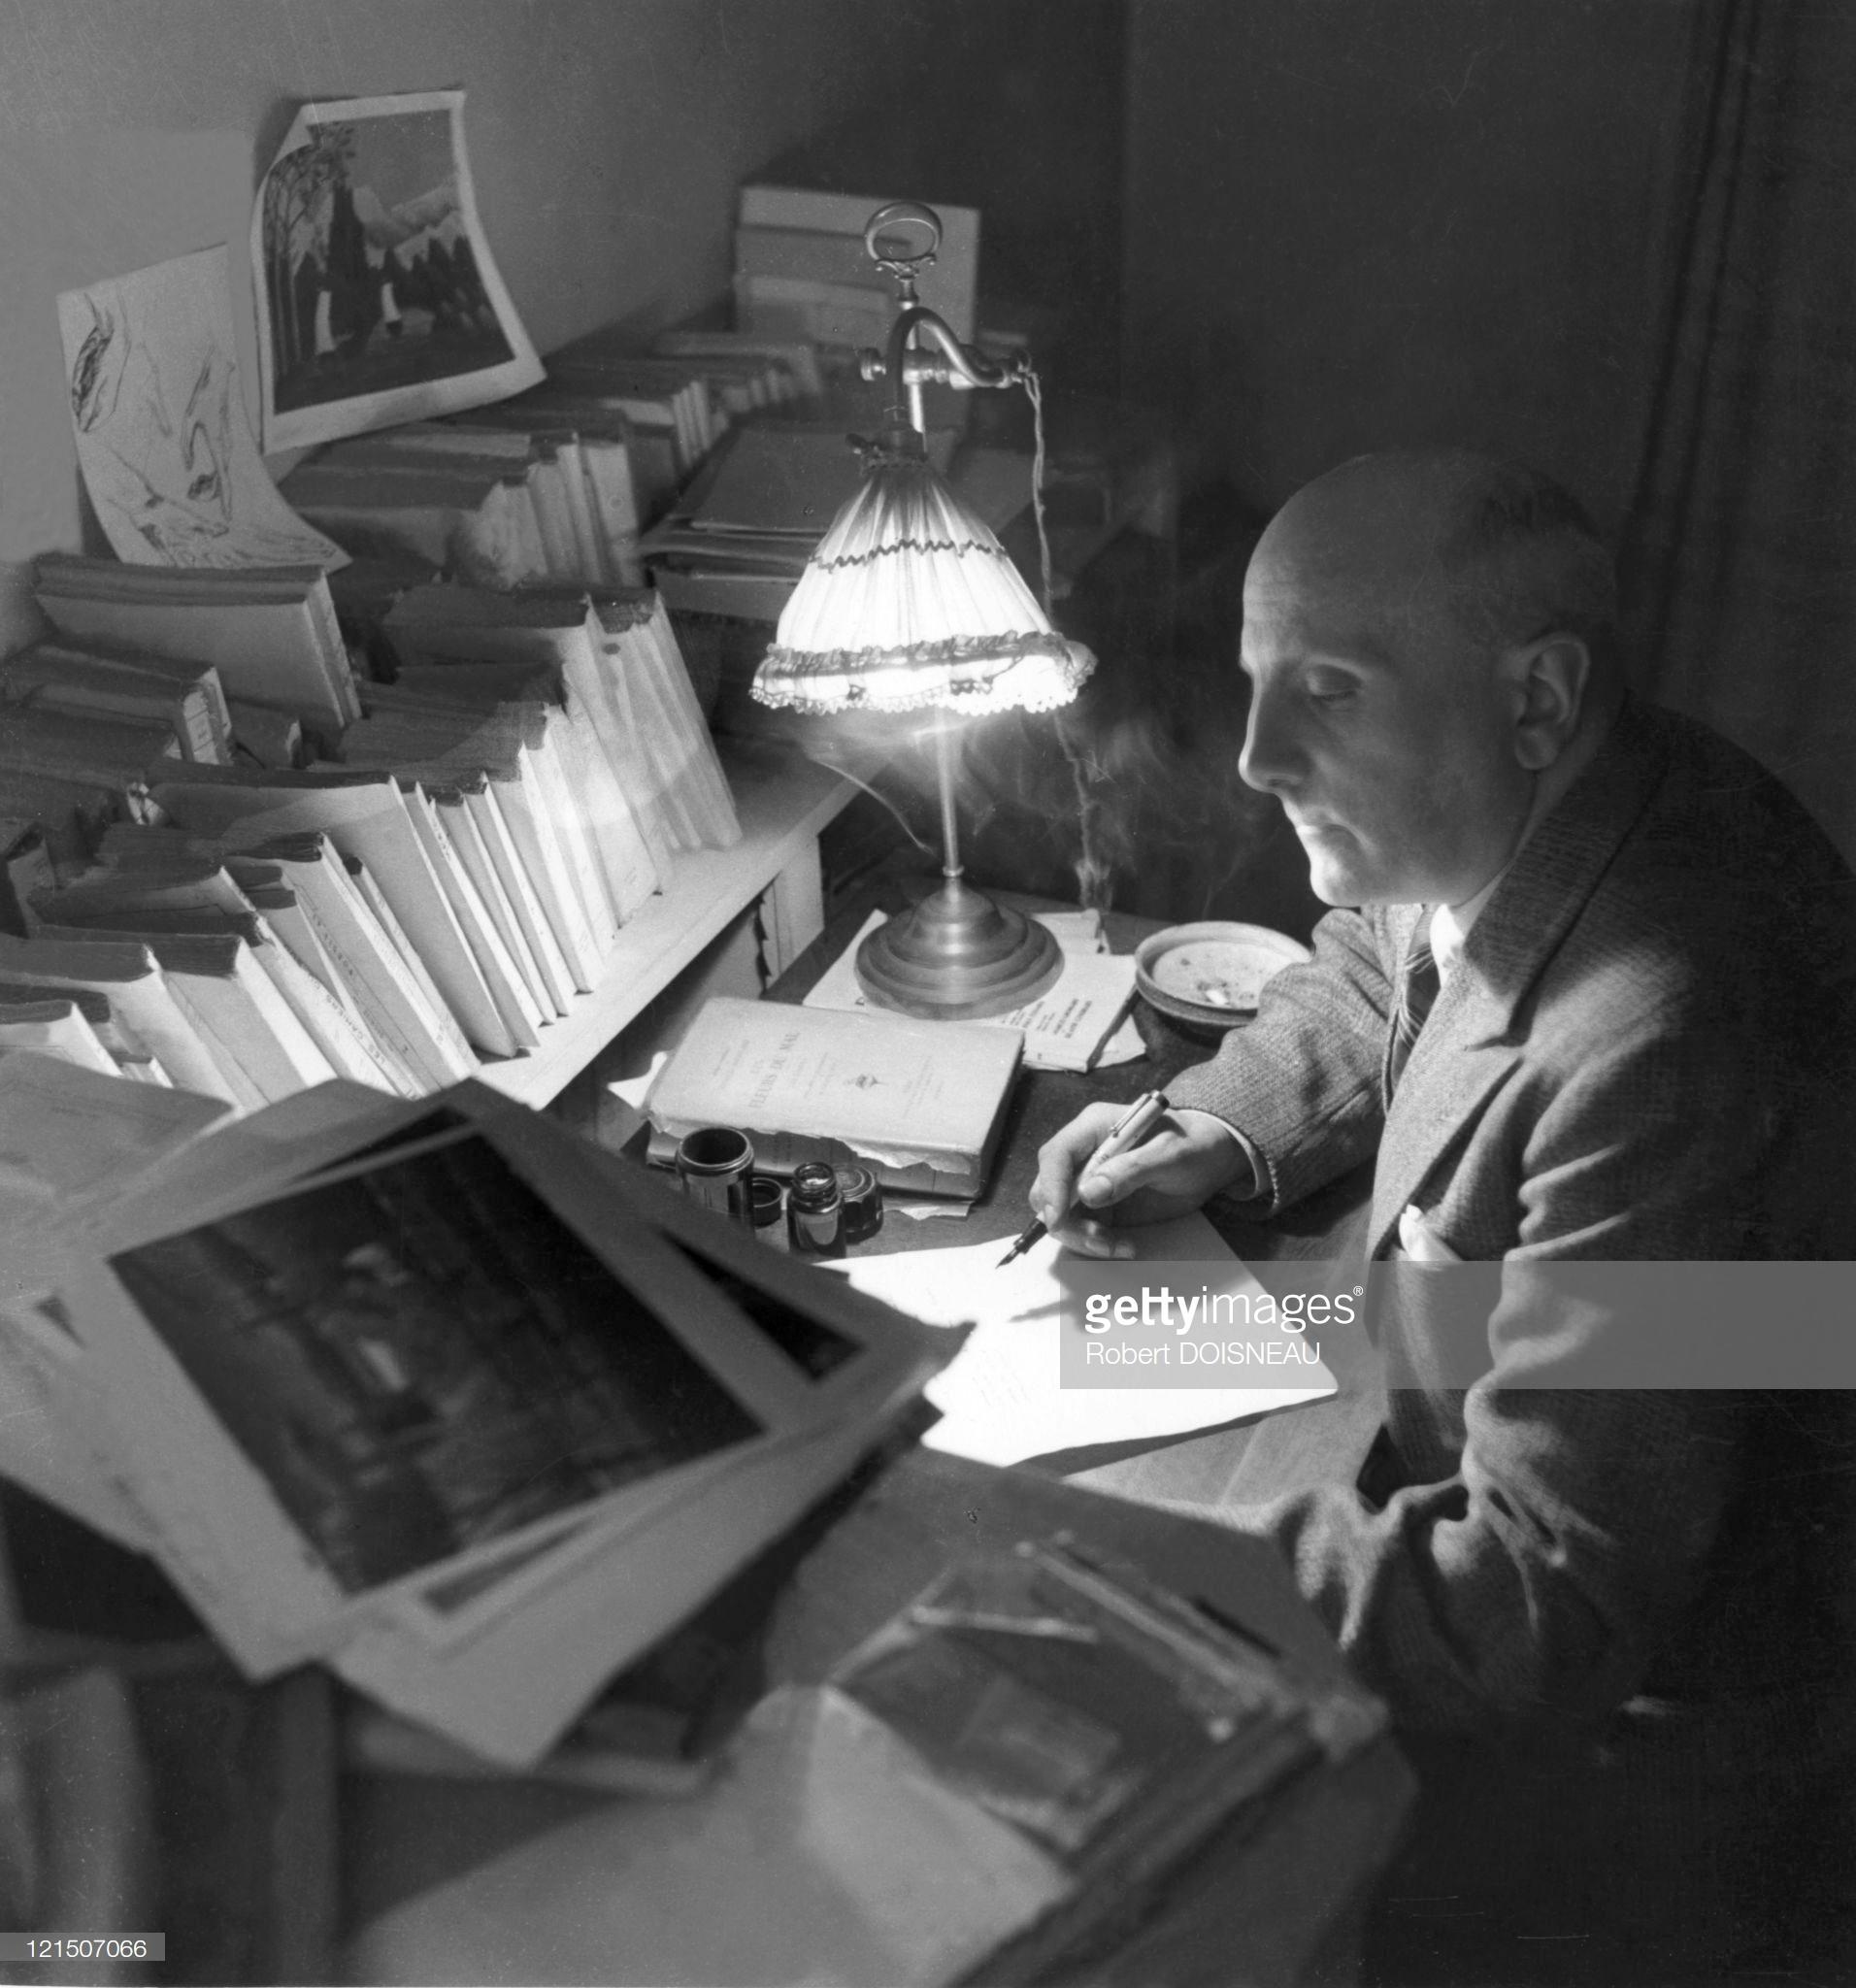 1944. Жан Тардьё — французский поэт, драматург, эссеист, переводчик. Один из зачинателей театра абсурда